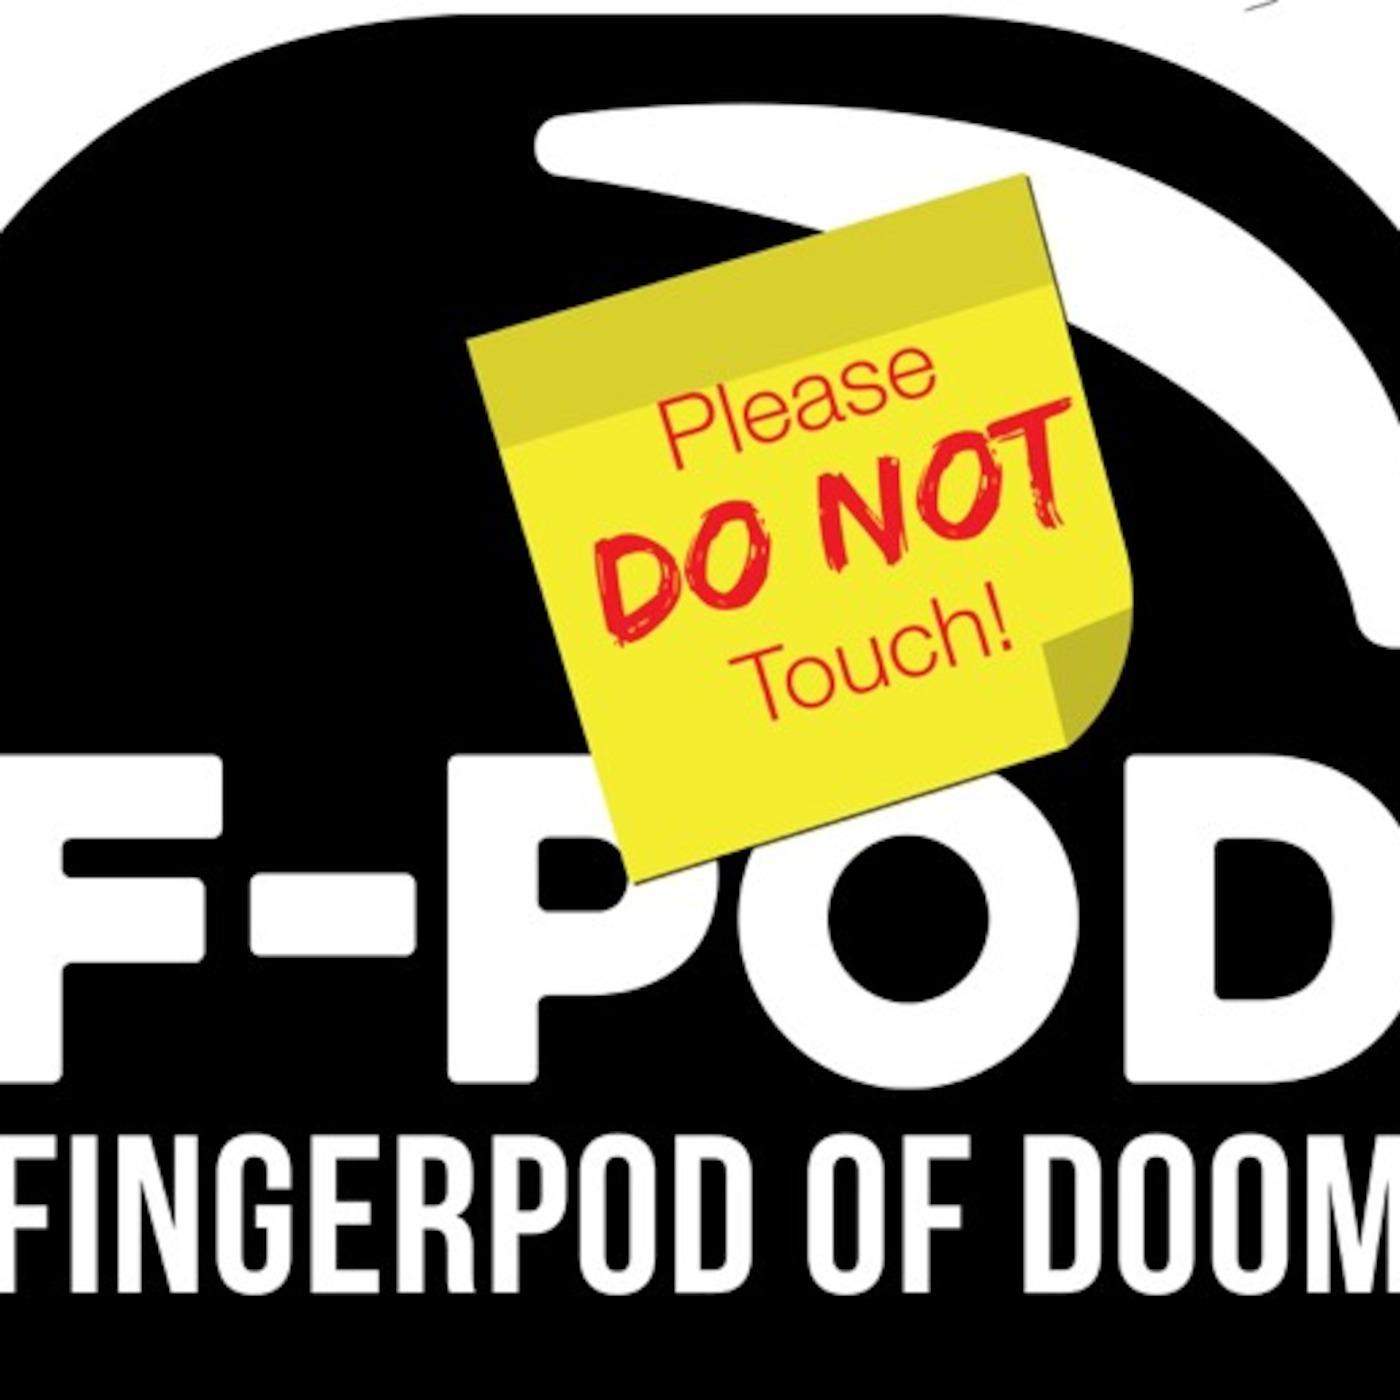 FingerPod Of Doom - Episode 2 Figure 4 Radio's podcast